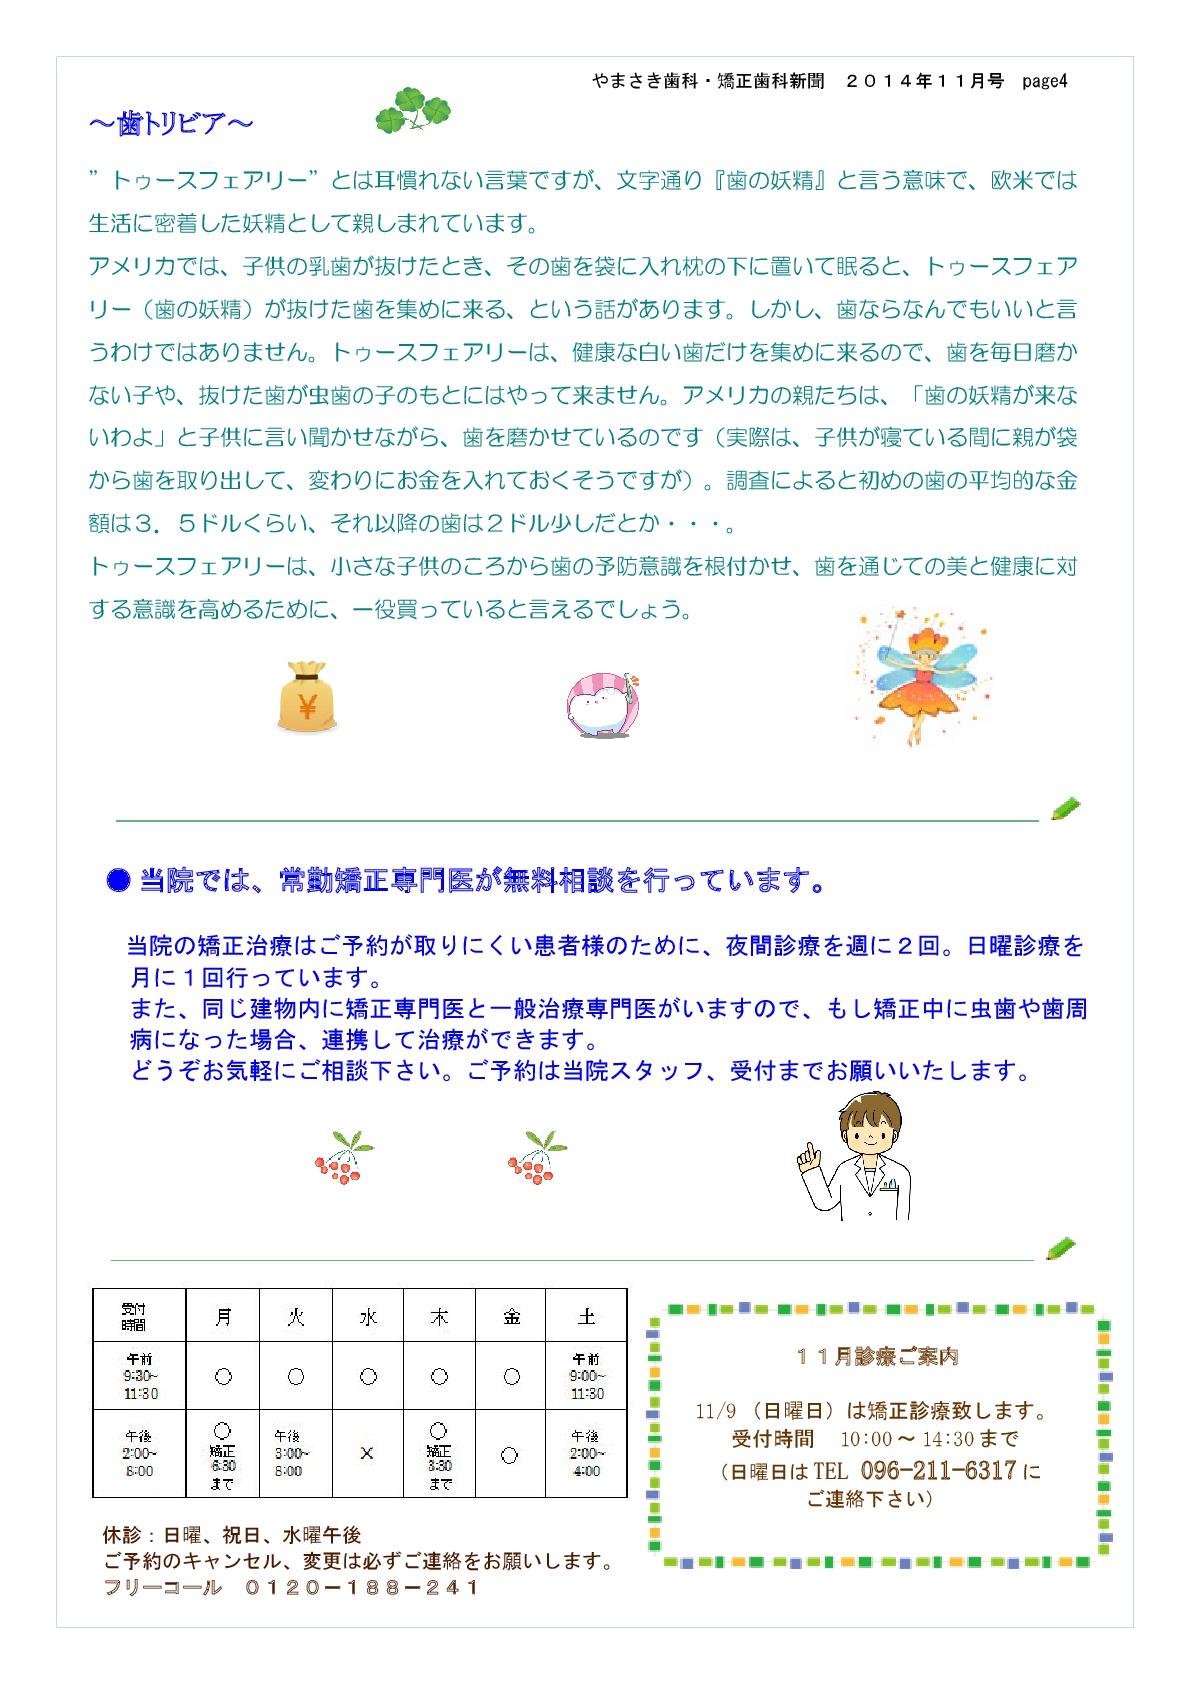 sinbun14-11-2-003